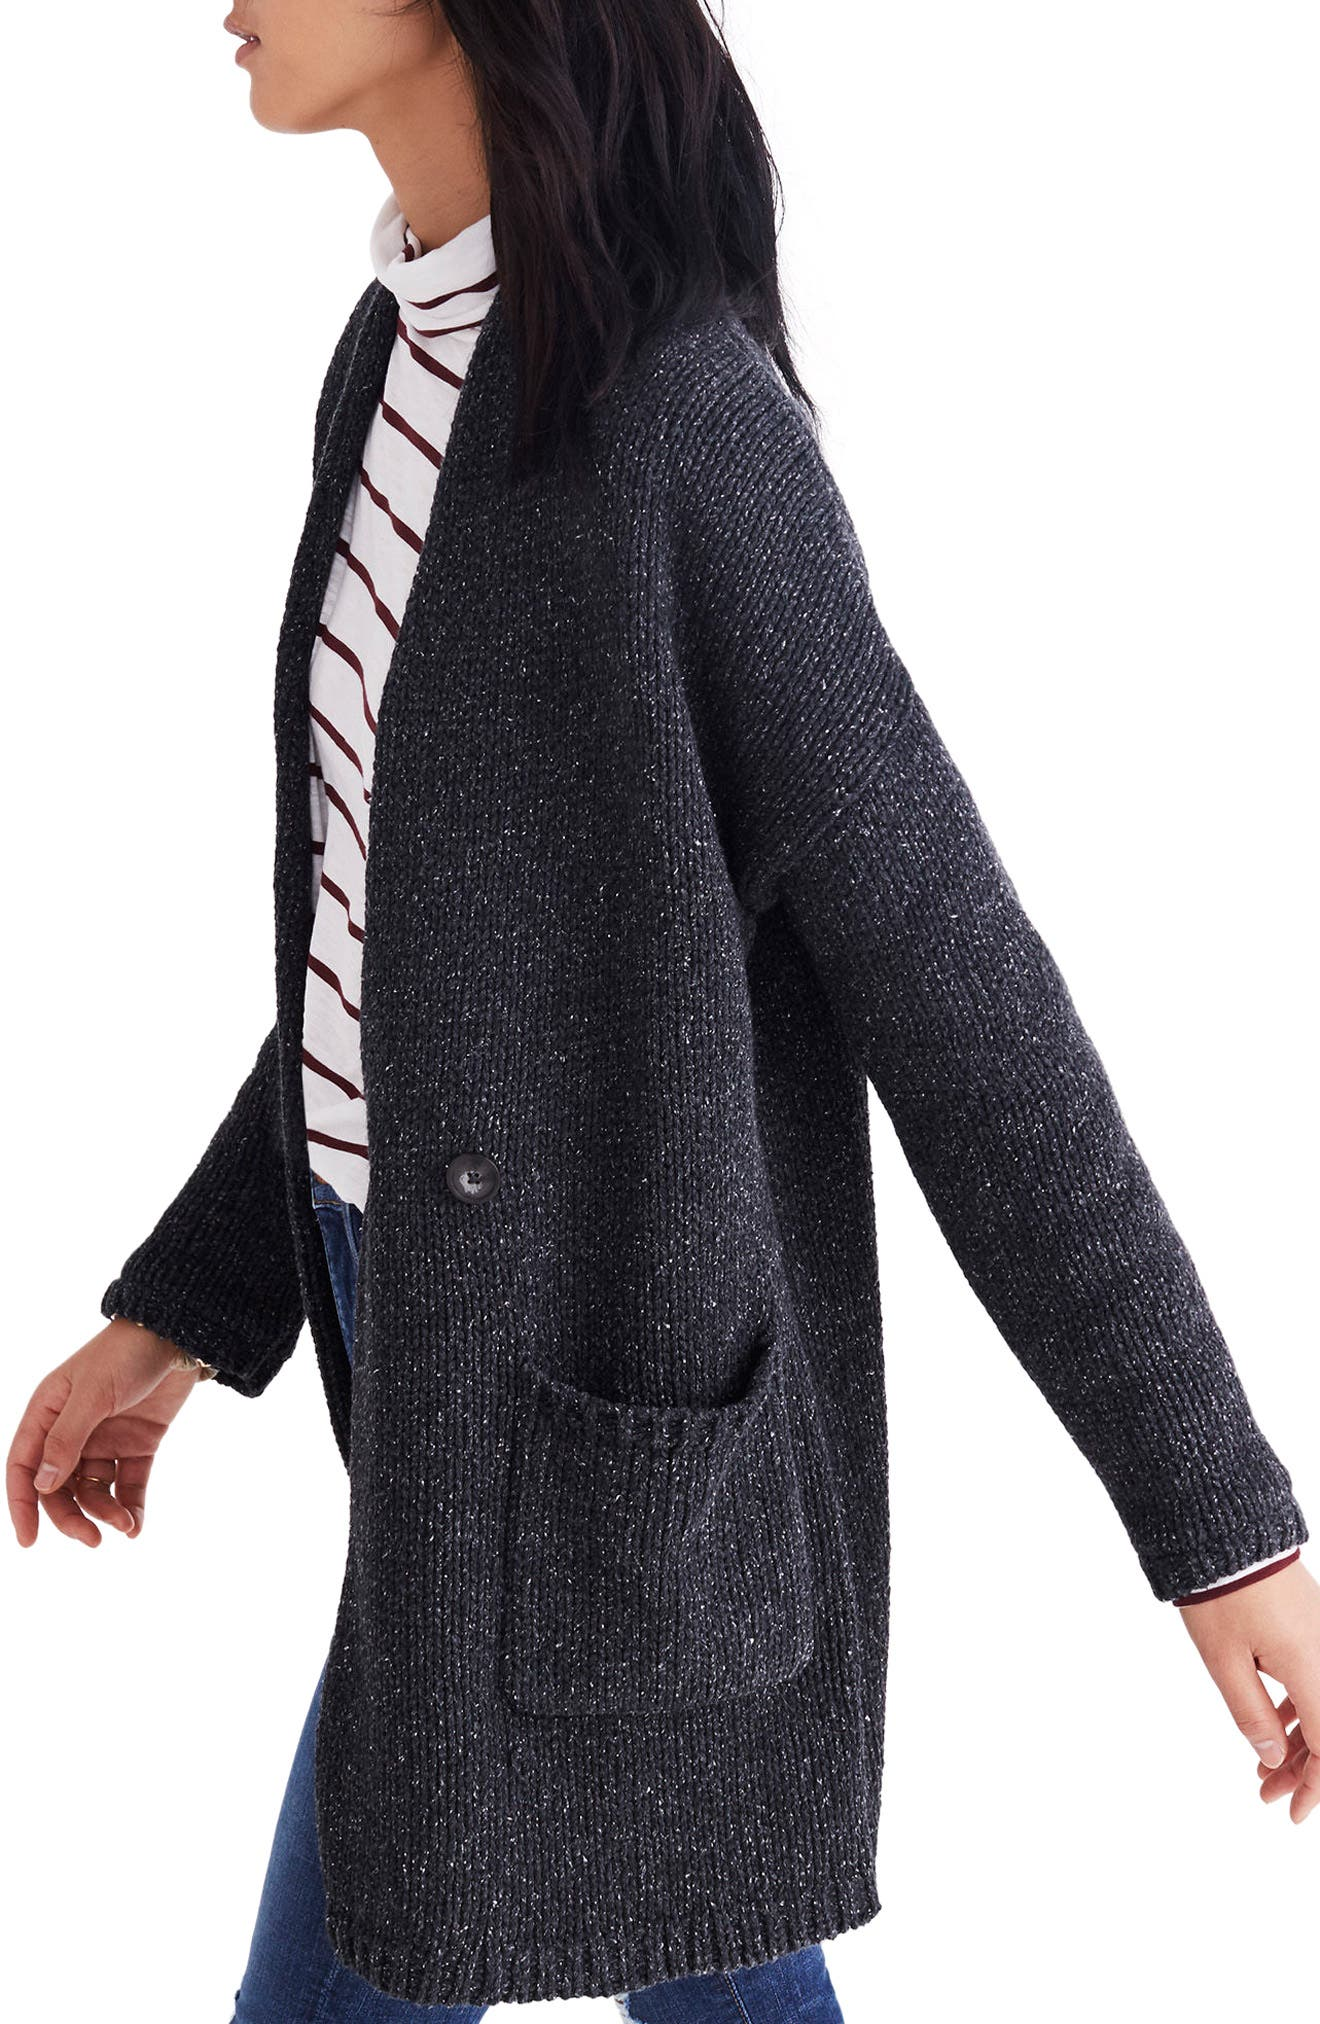 Glenhill Sweater Coat,                             Alternate thumbnail 3, color,